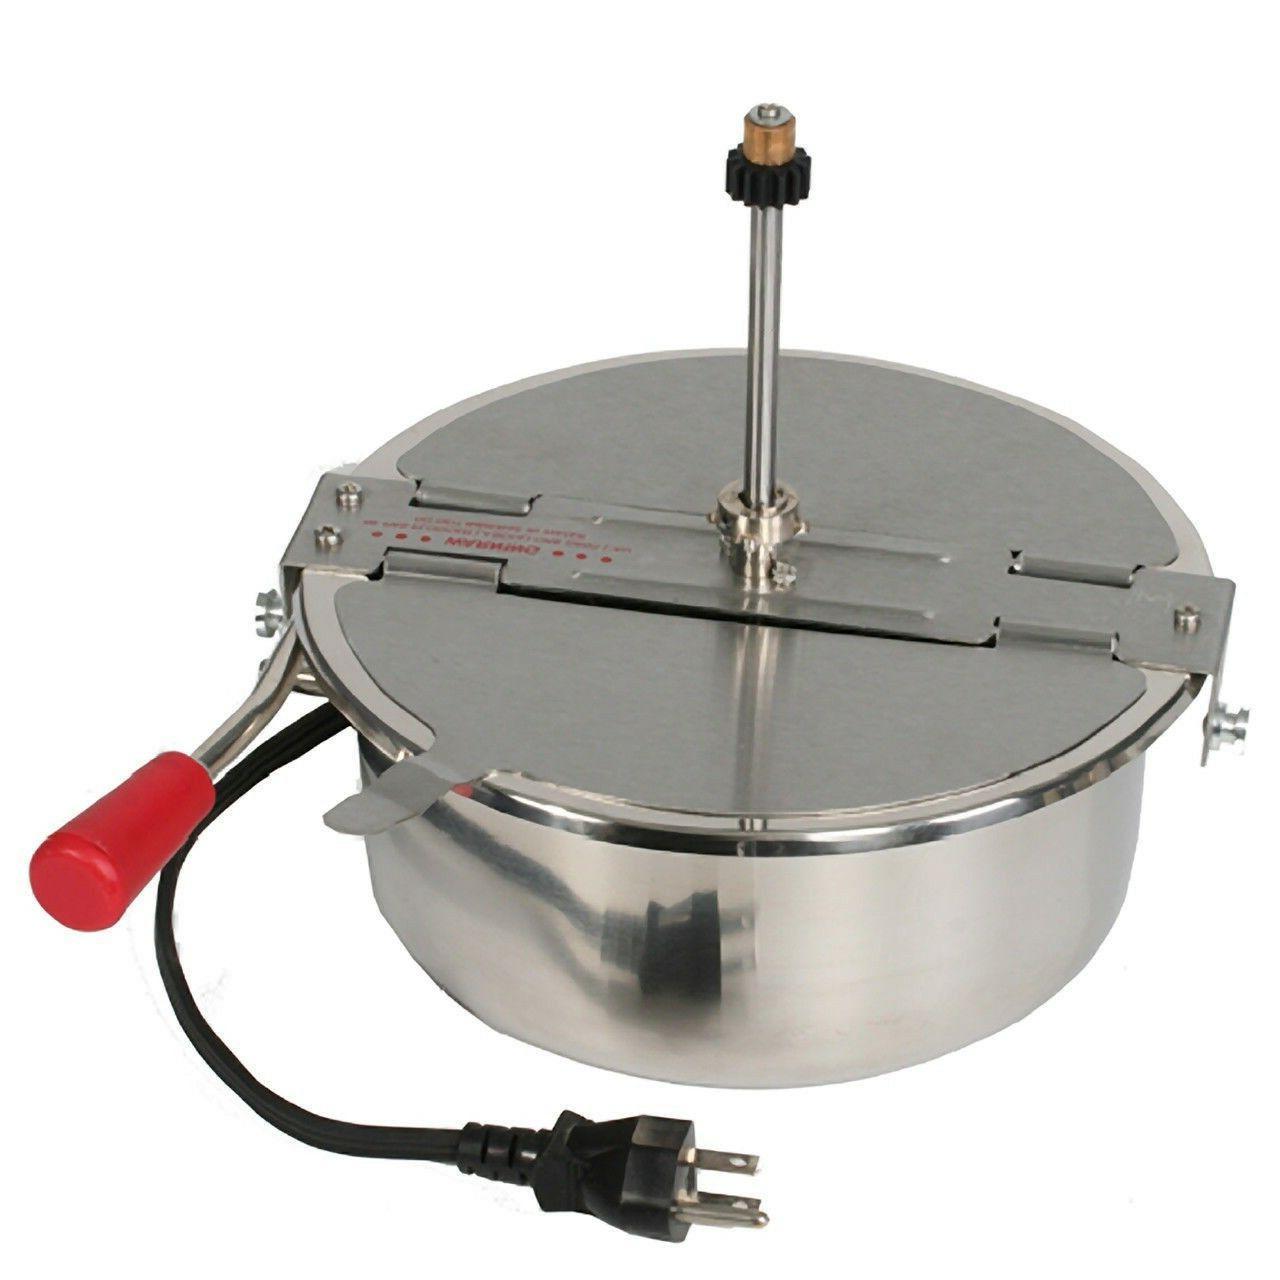 8 oz replacement popcorn kettle popcorn maker